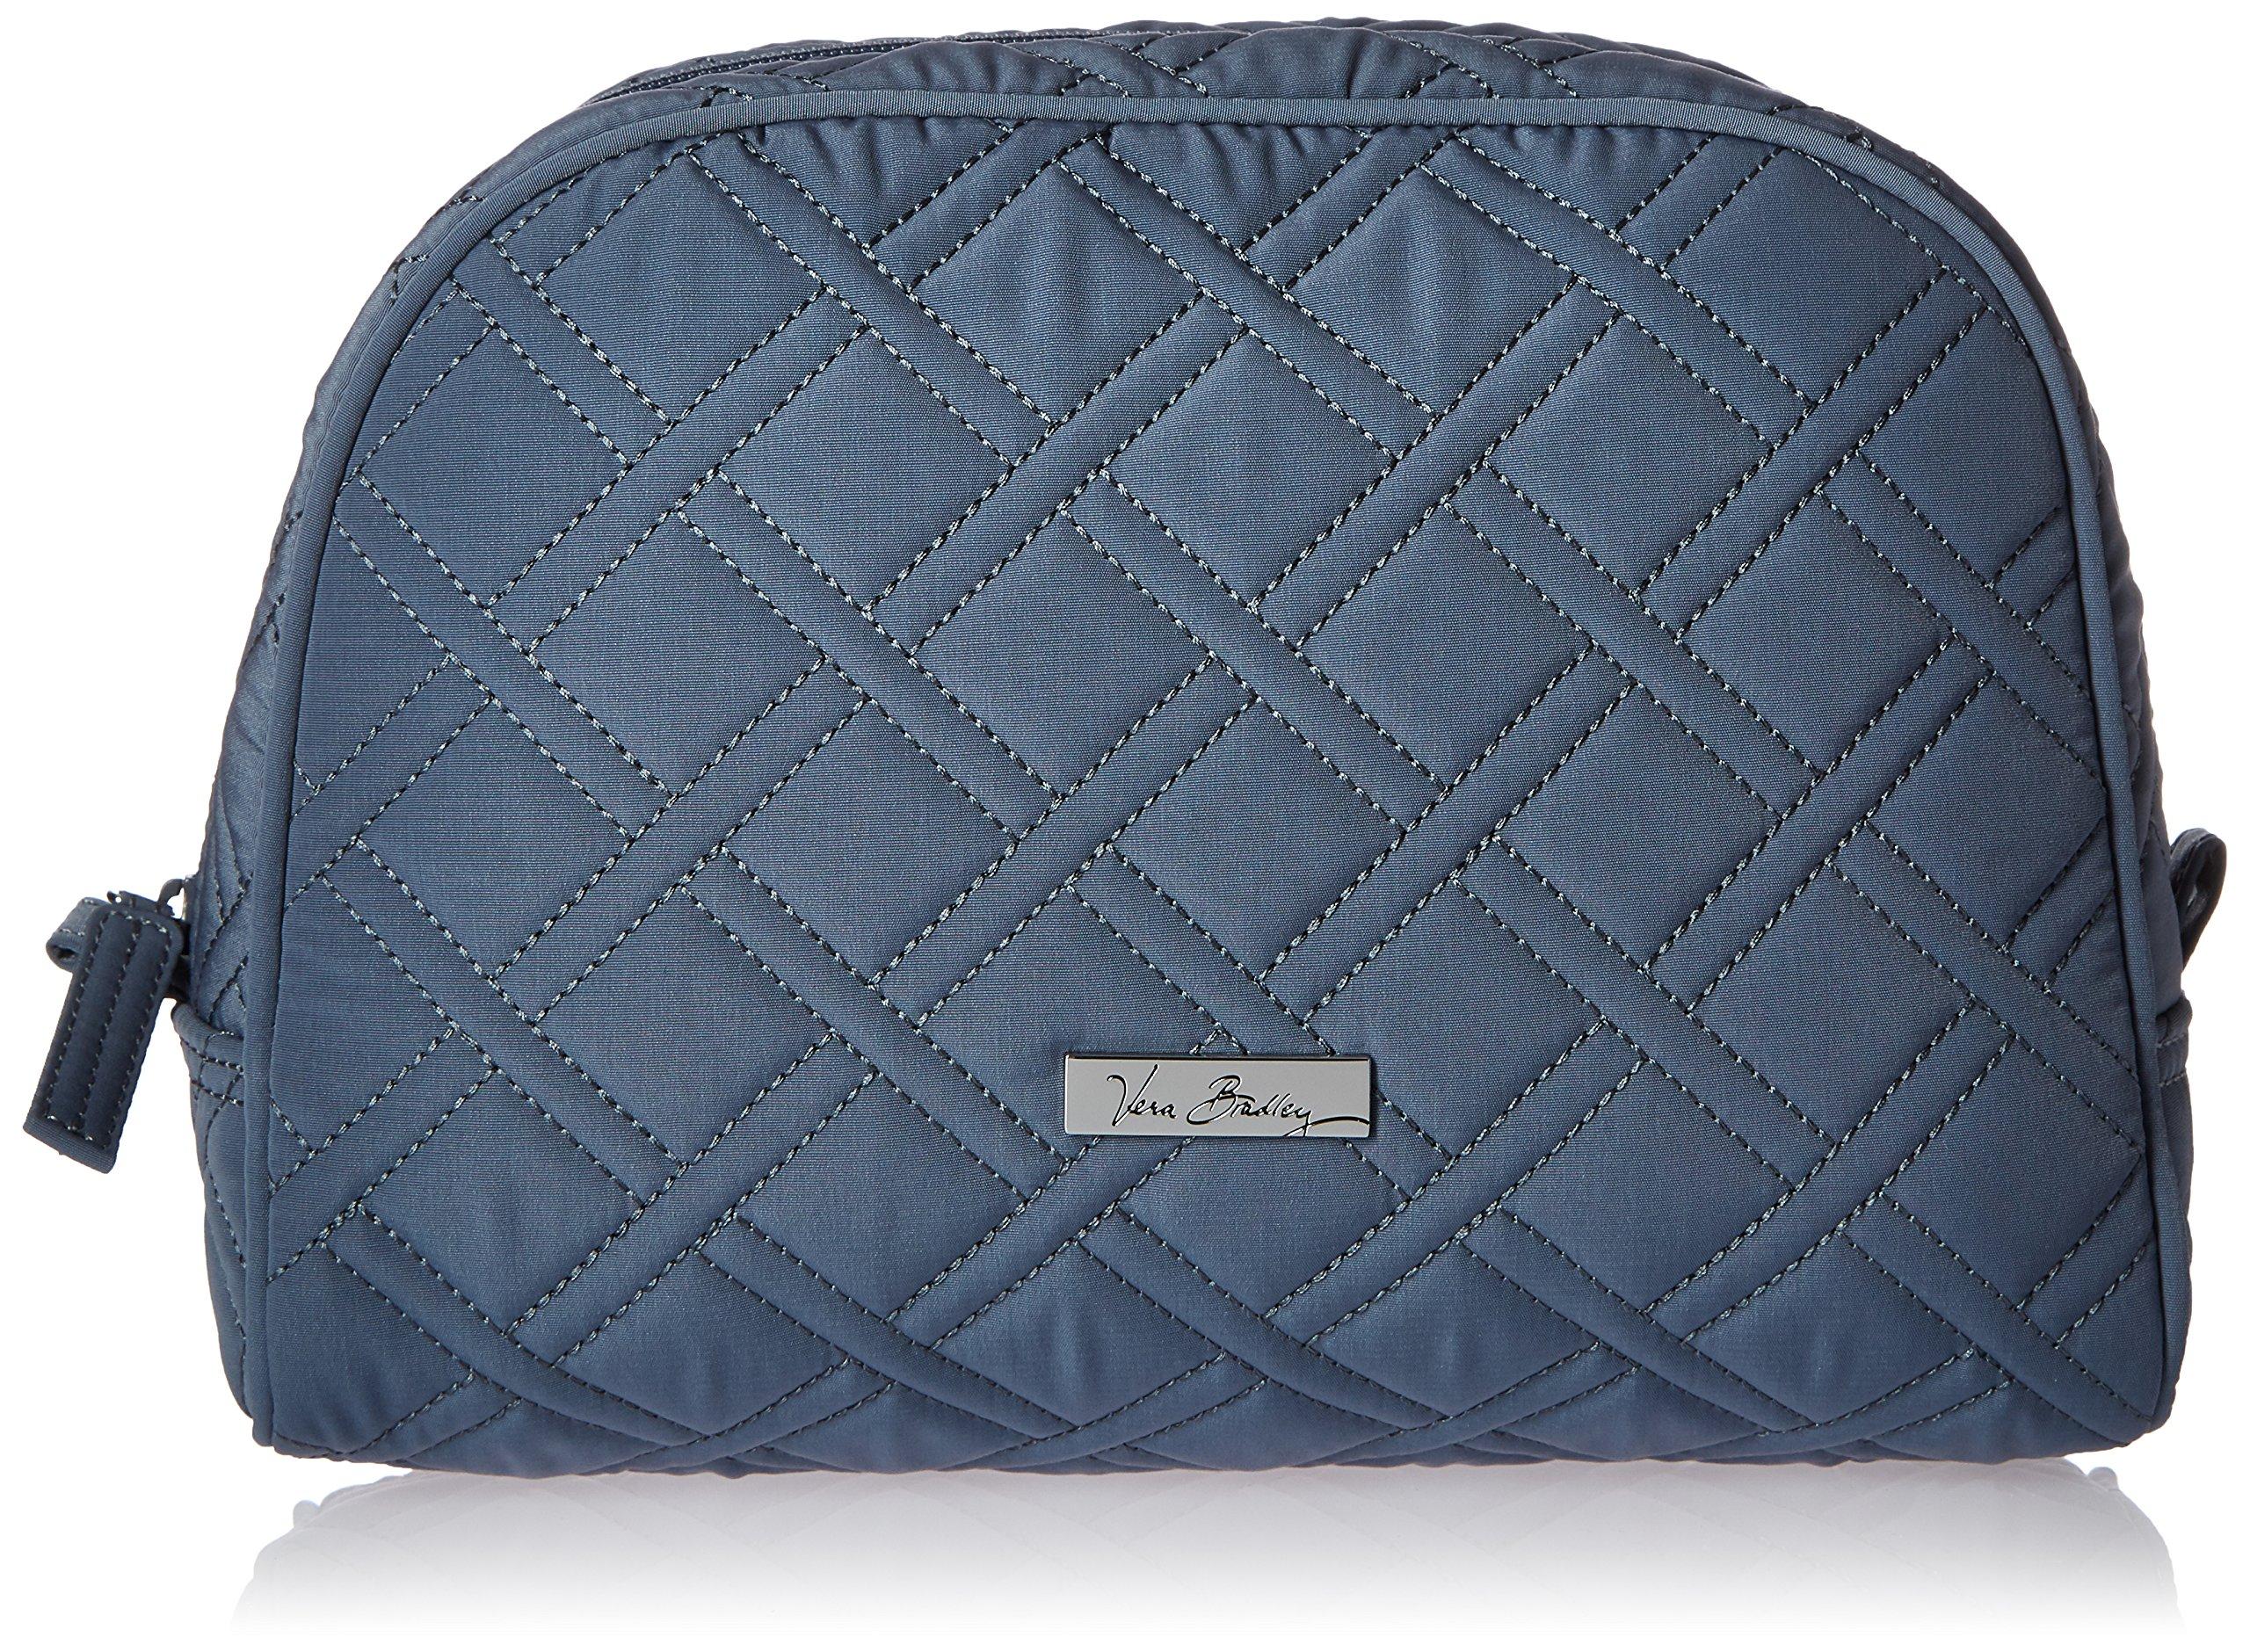 Vera Bradley Large Zip Cosmetic, Charcoal